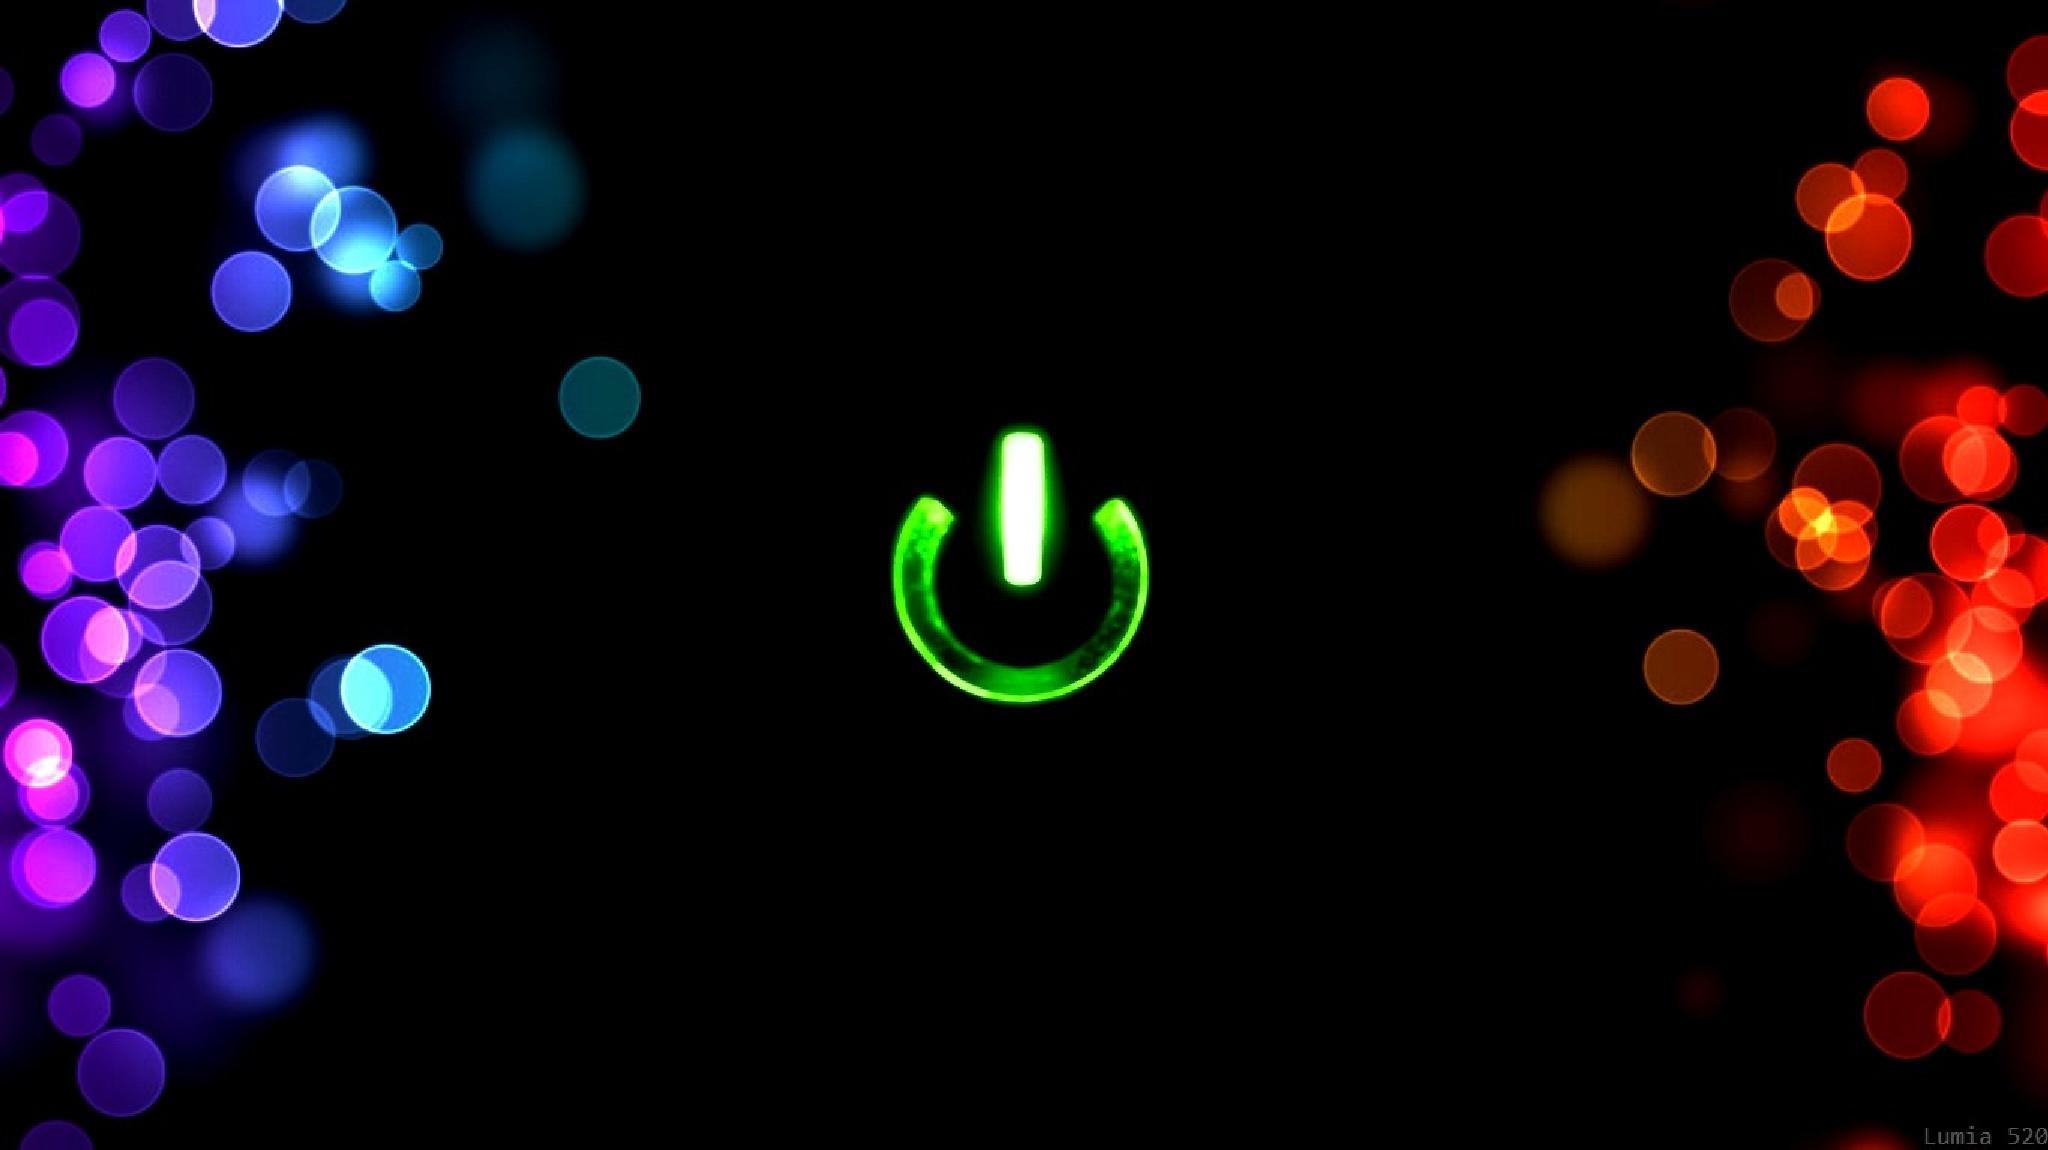 The Power Button by Shahul Rahman